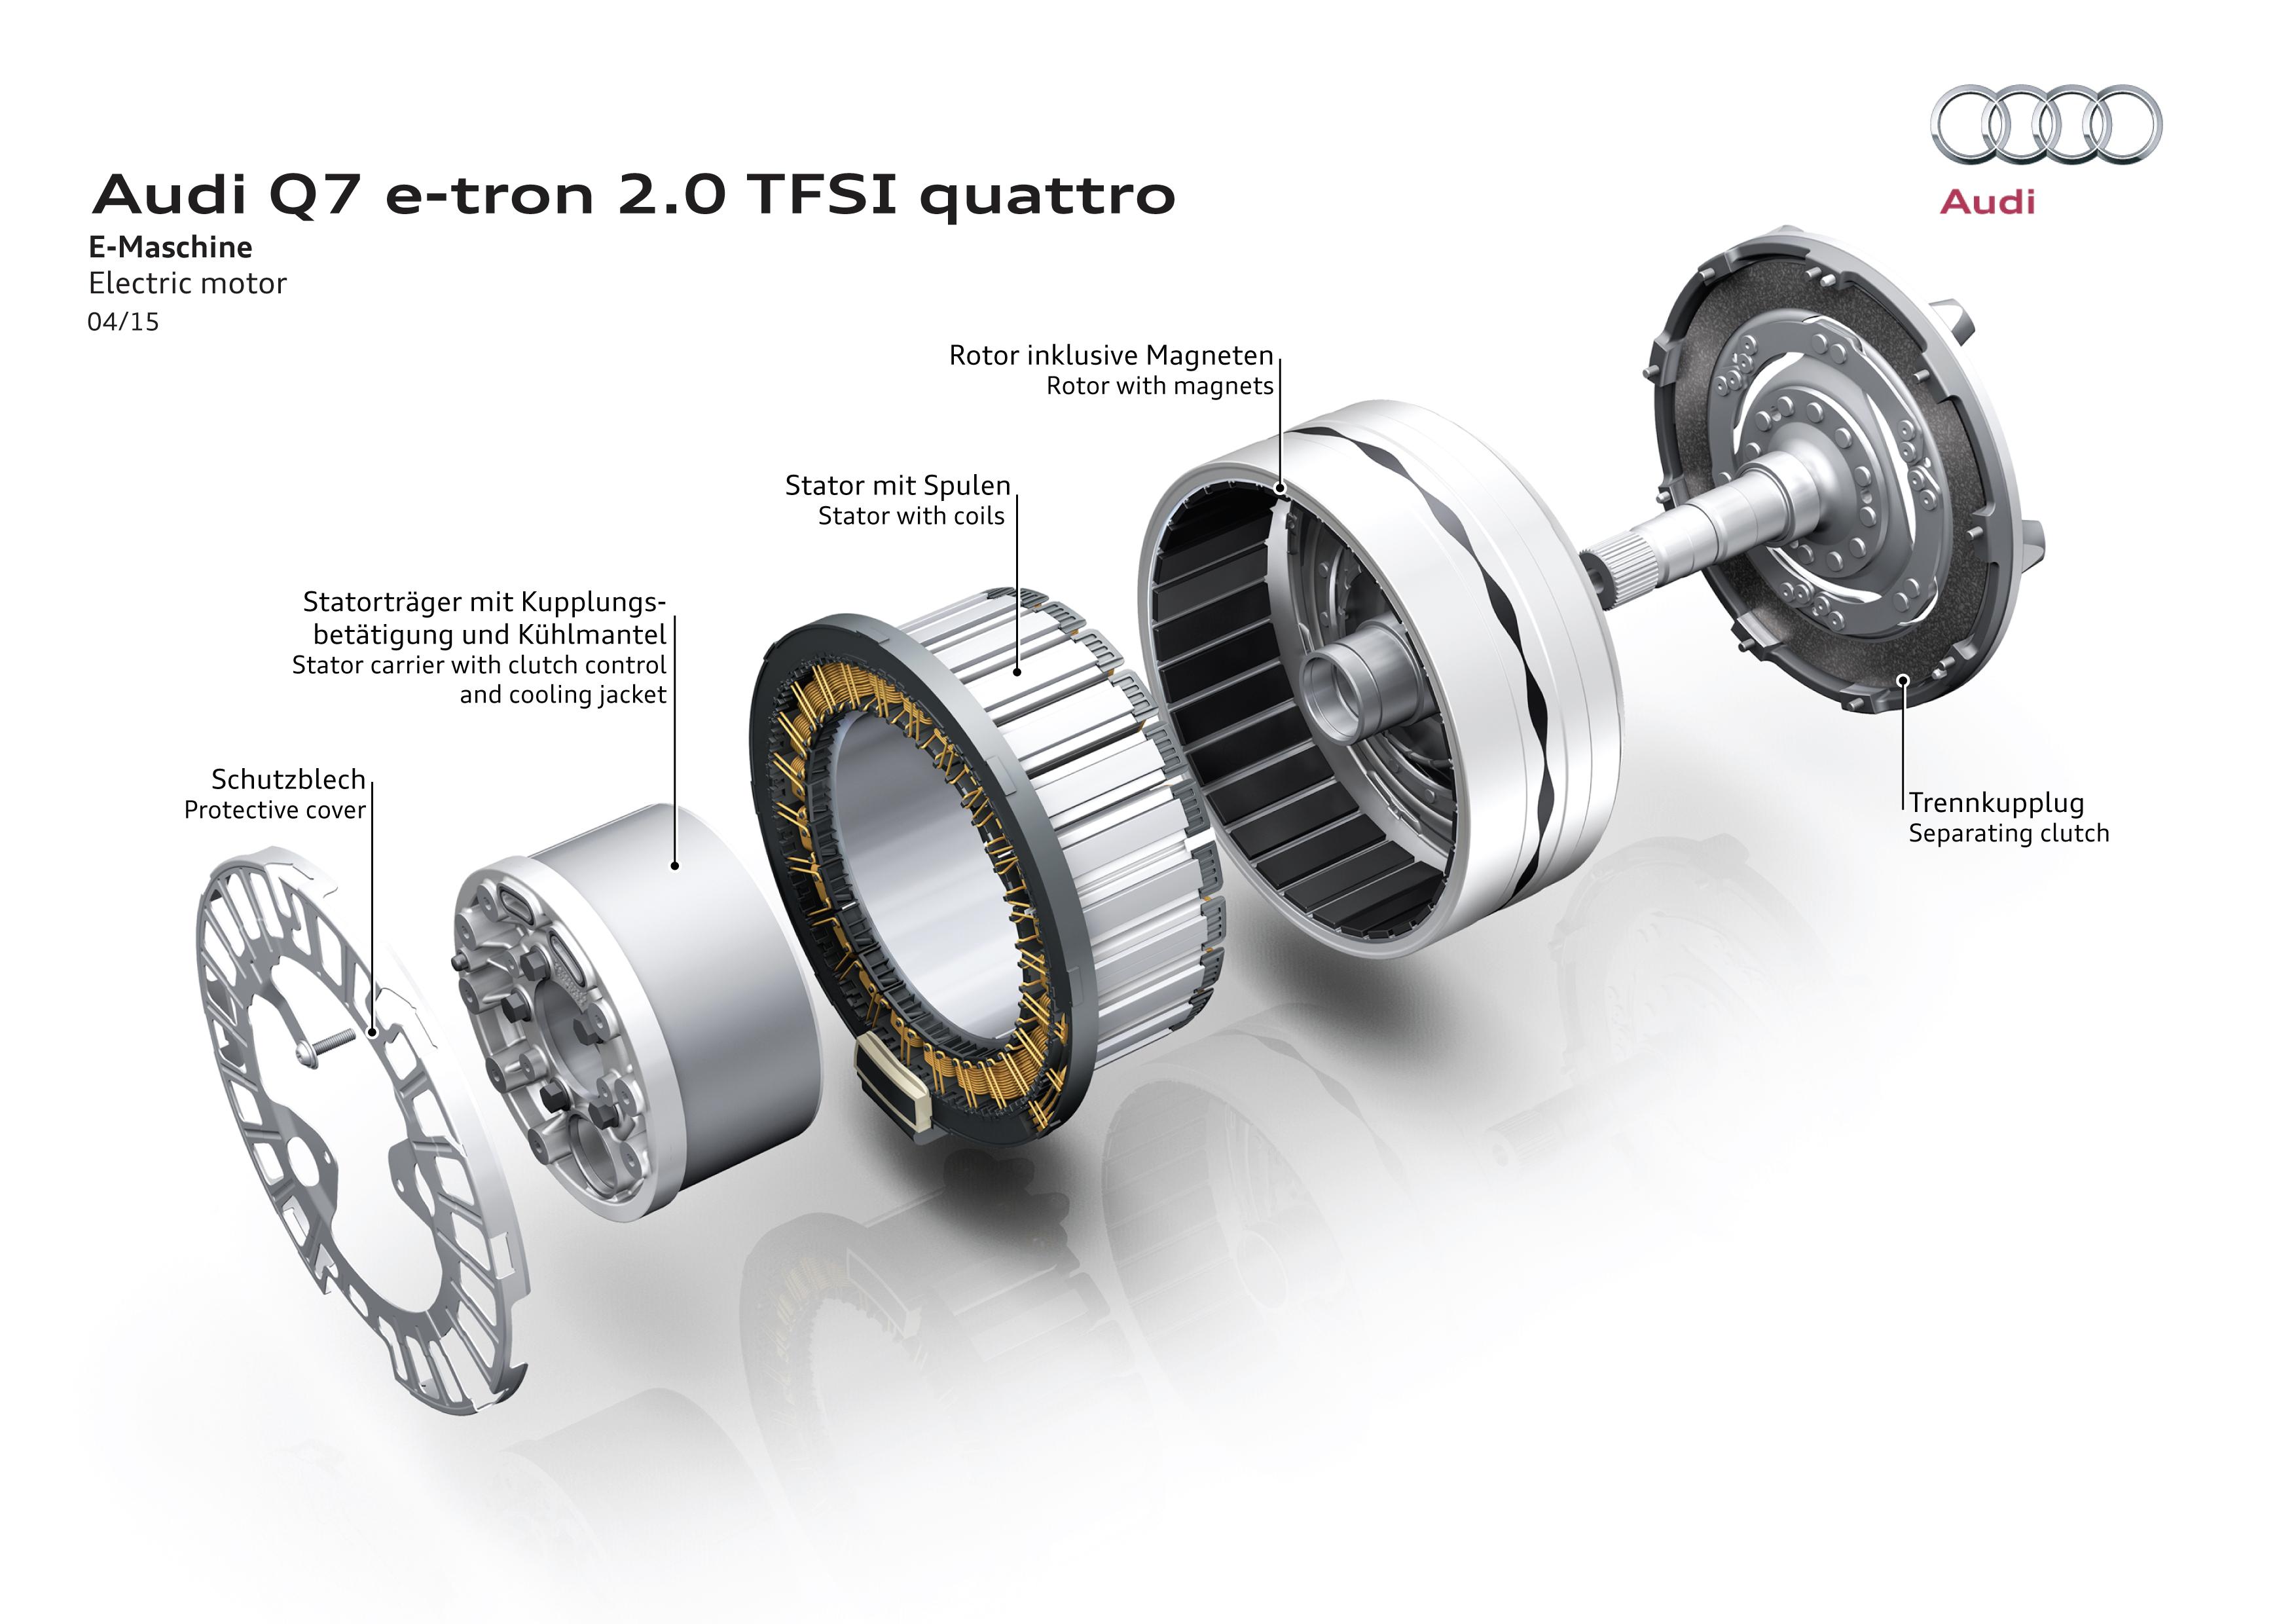 Audi Q7 e-tron 2.0 TFSI quattro - 2015 - electric motor